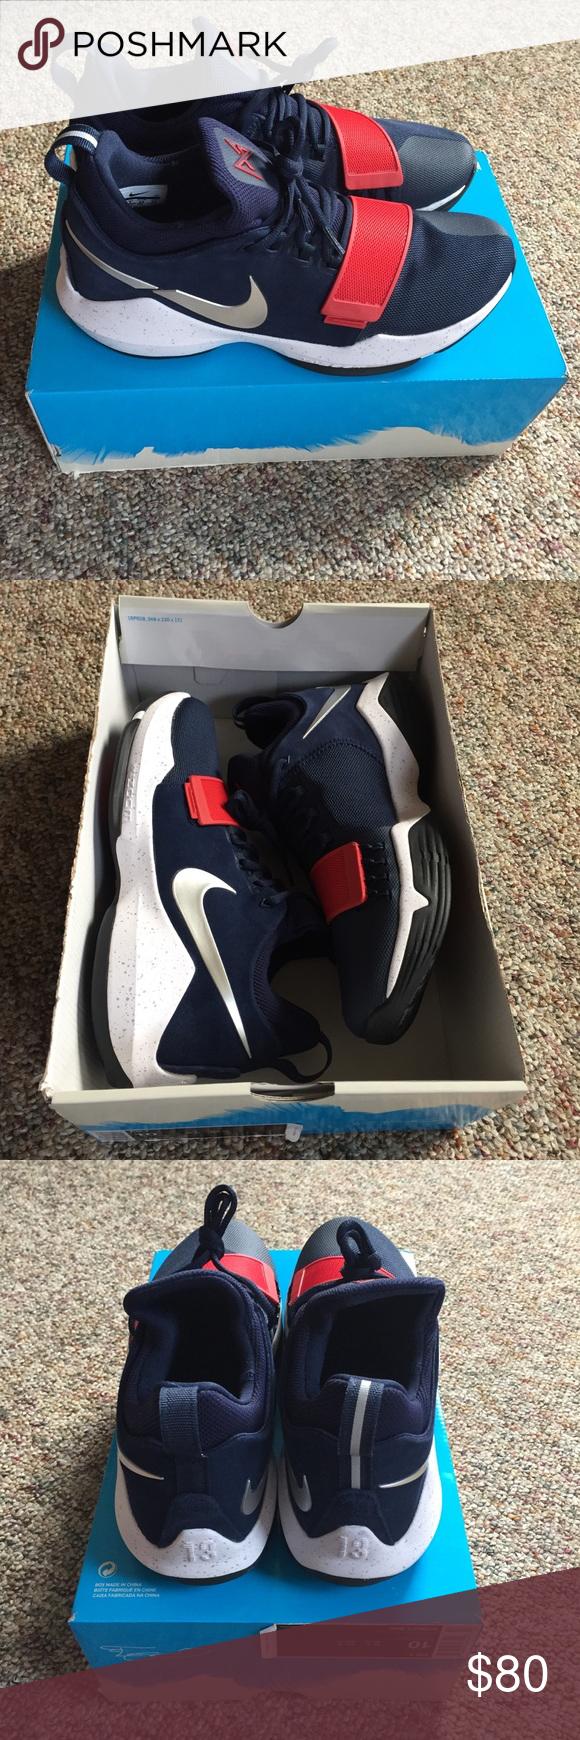 Nike PG1 USA Olympics Blue Shoes Men's 10 NWB PG 1